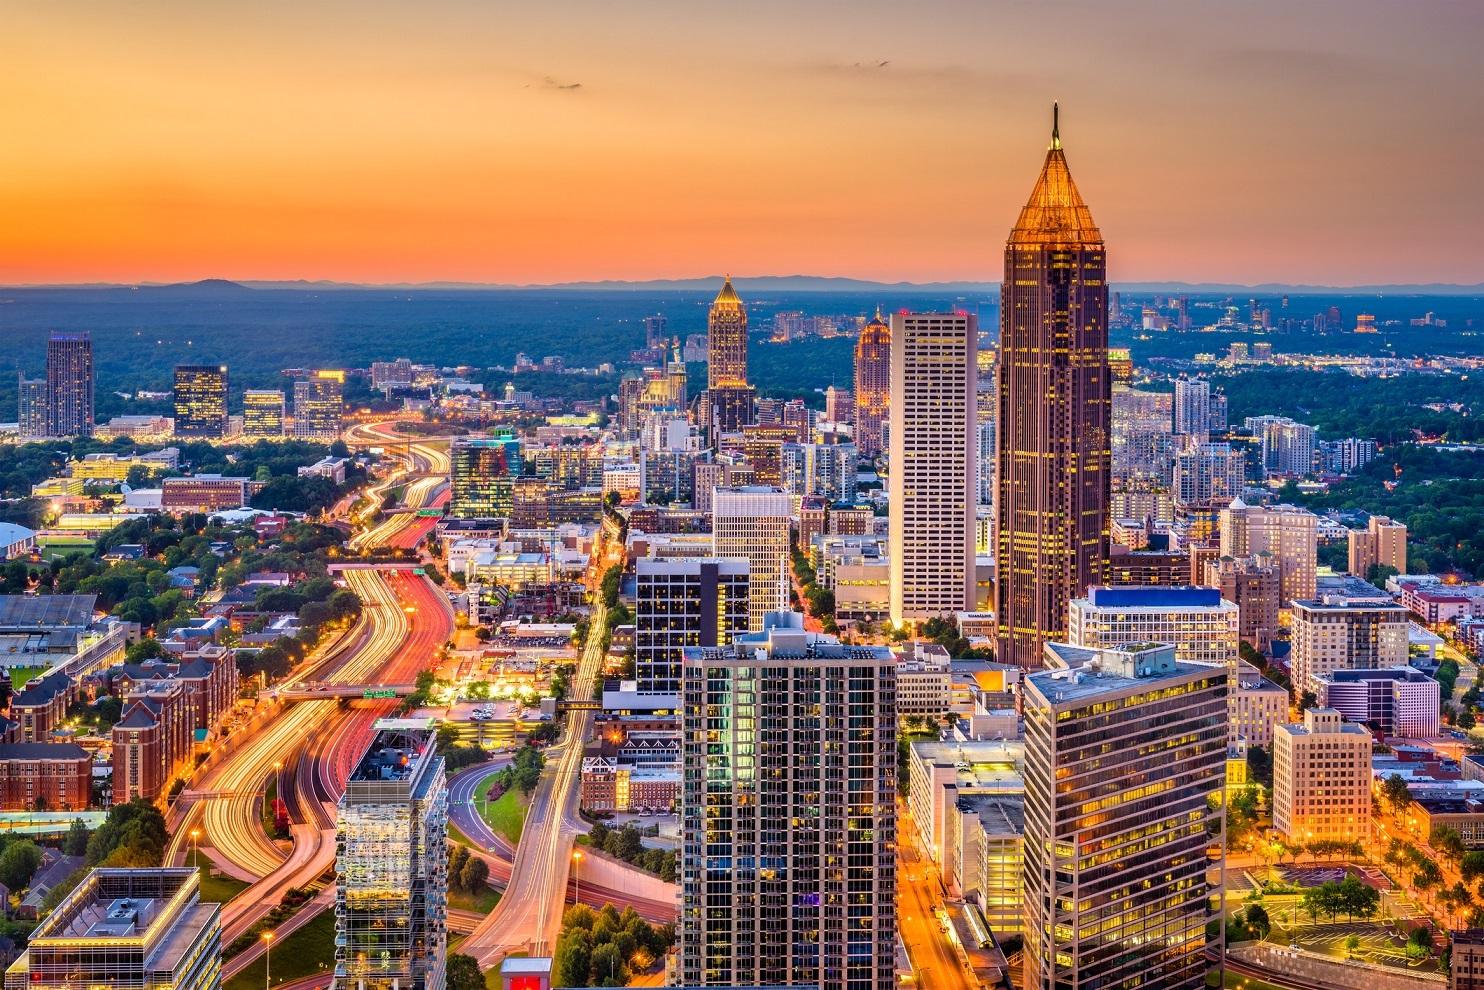 Atlanta, Georgia downtown skyline at dusk